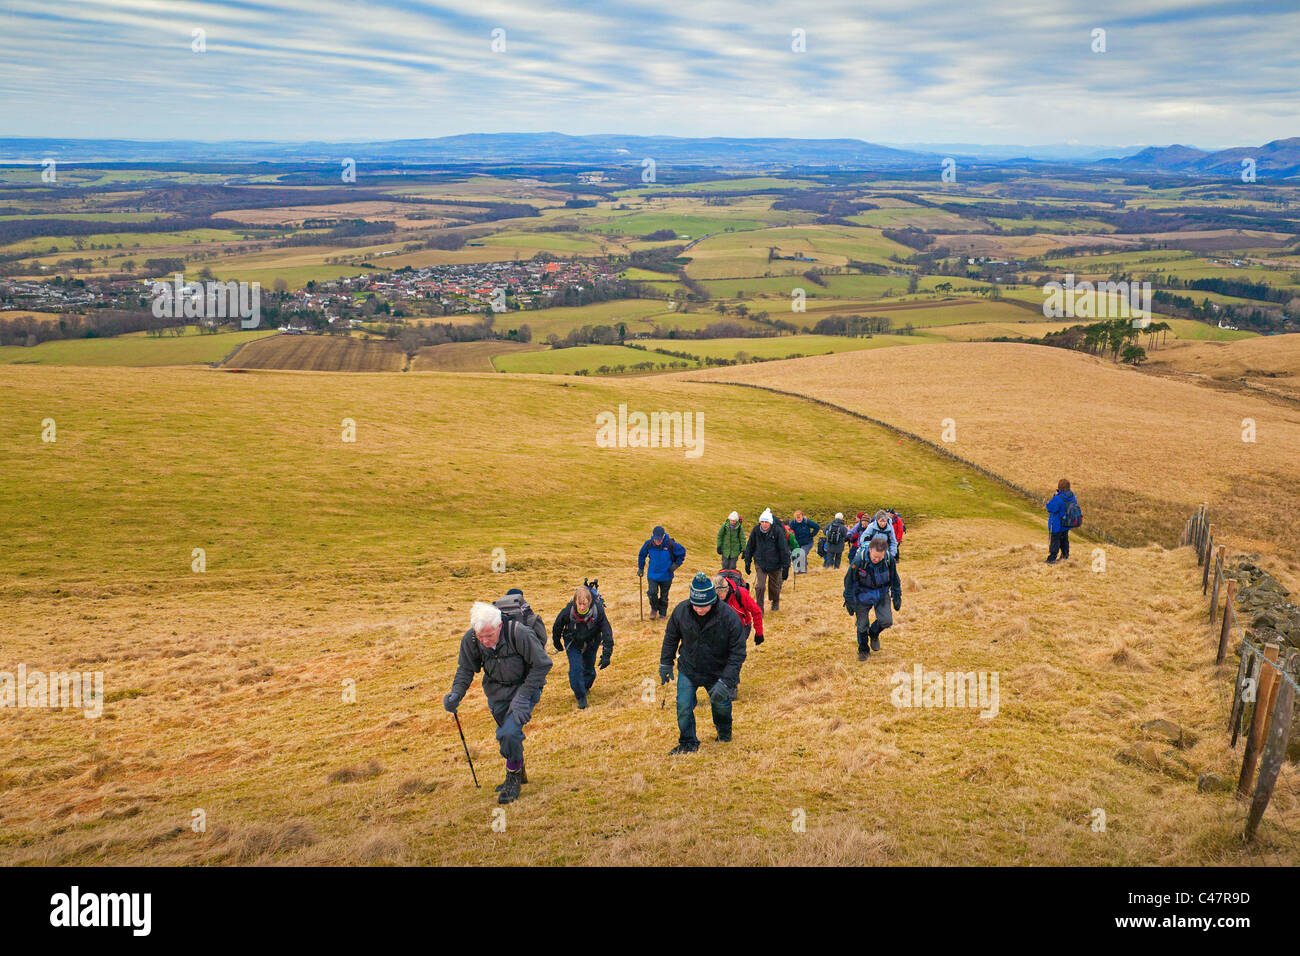 Un club de randonnée escalade la colline salin au-dessus du village de la Saline Banque D'Images